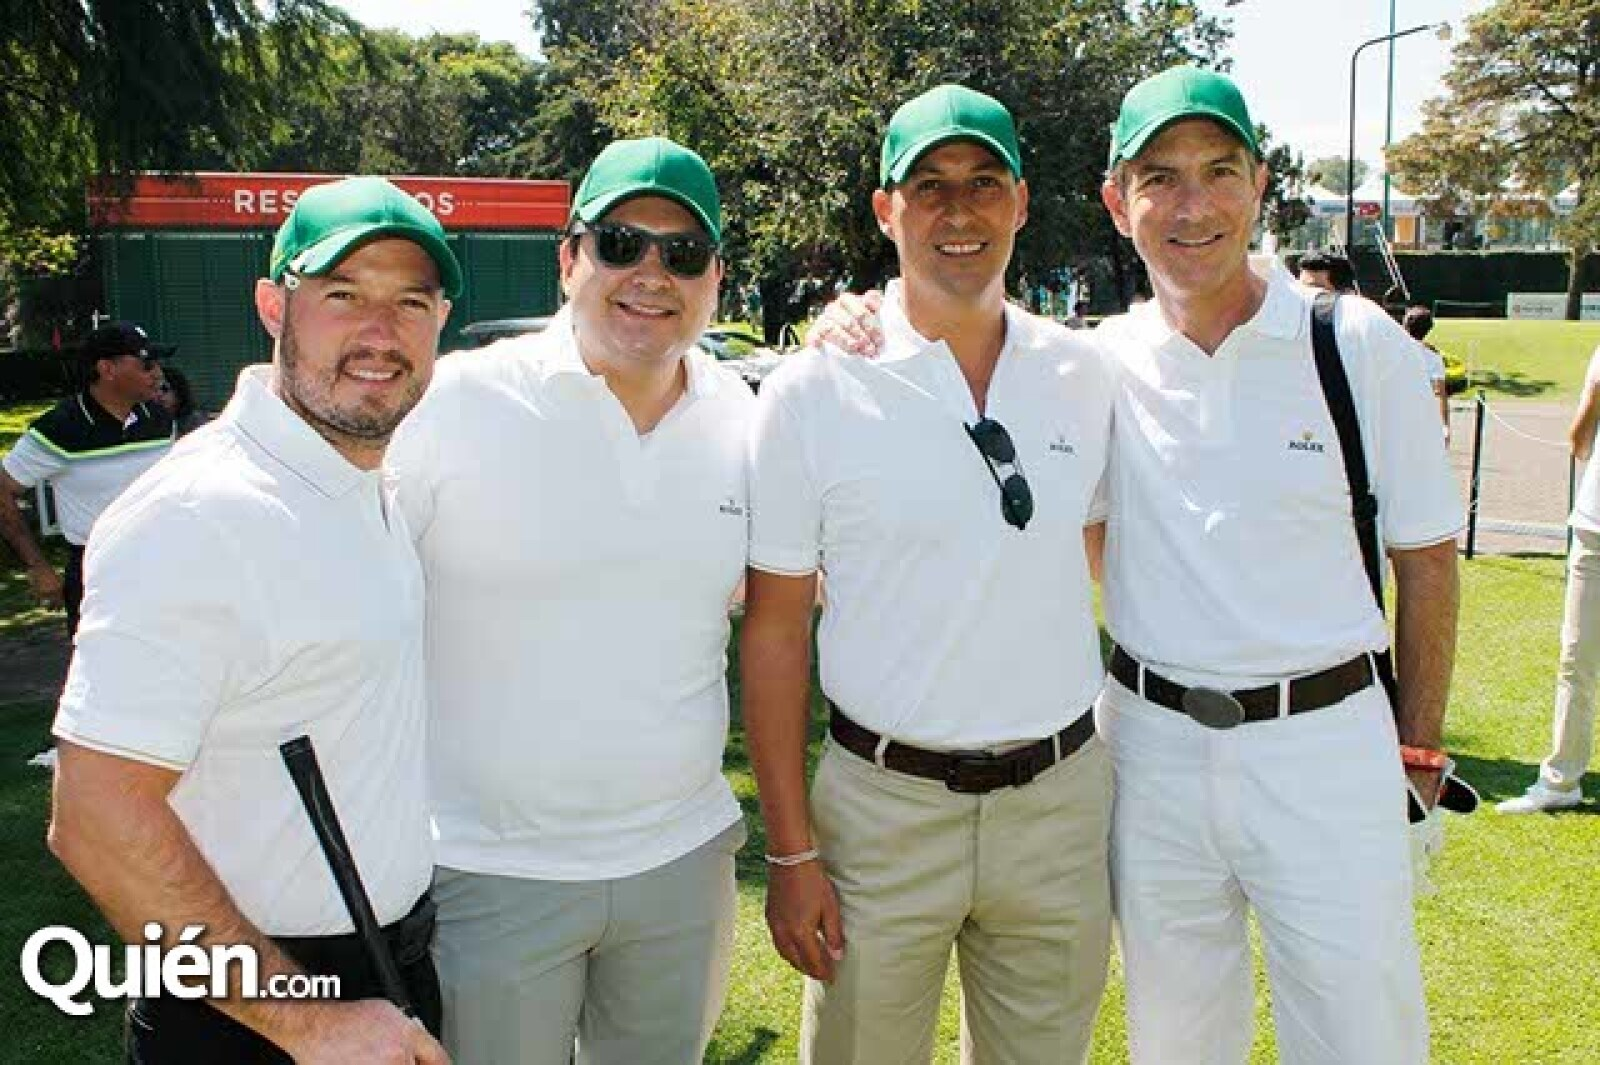 Renato Sandoval,Alberto Vega,Max Linares y Sergio Stern